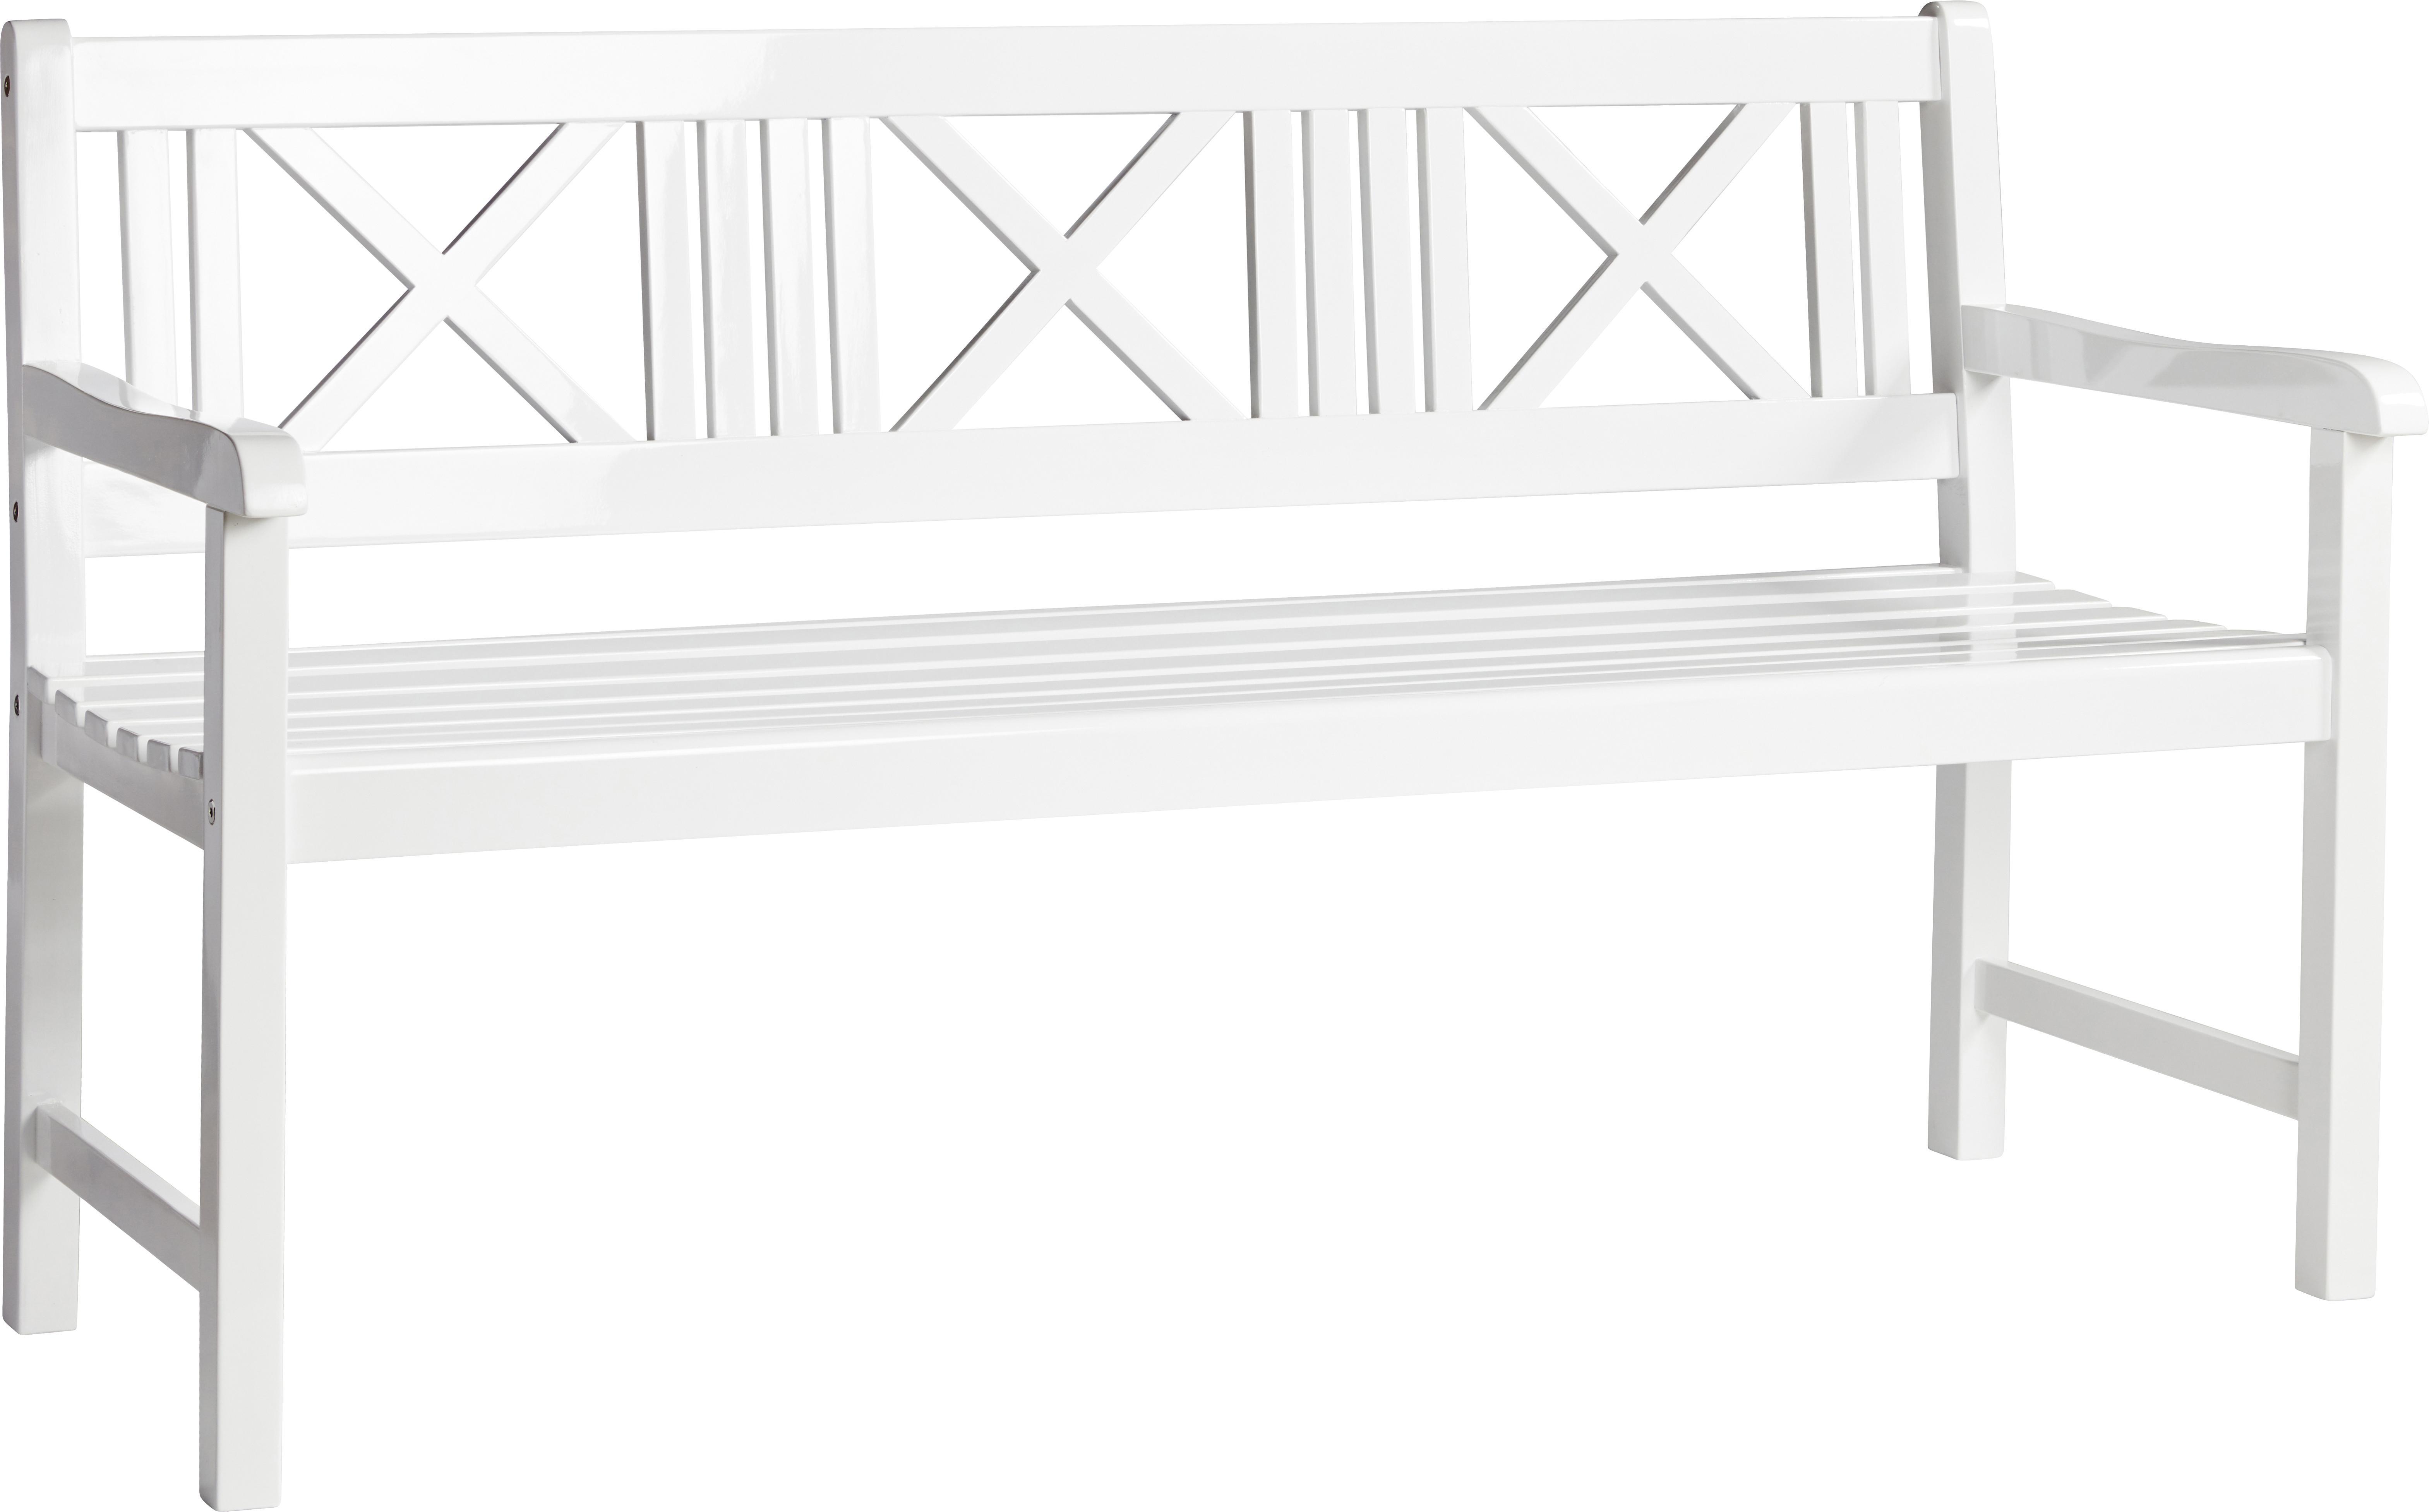 Banco de jardín de madera Rosenborg, Madera de teca lijada, Blanco, An 150 x Al 89 cm